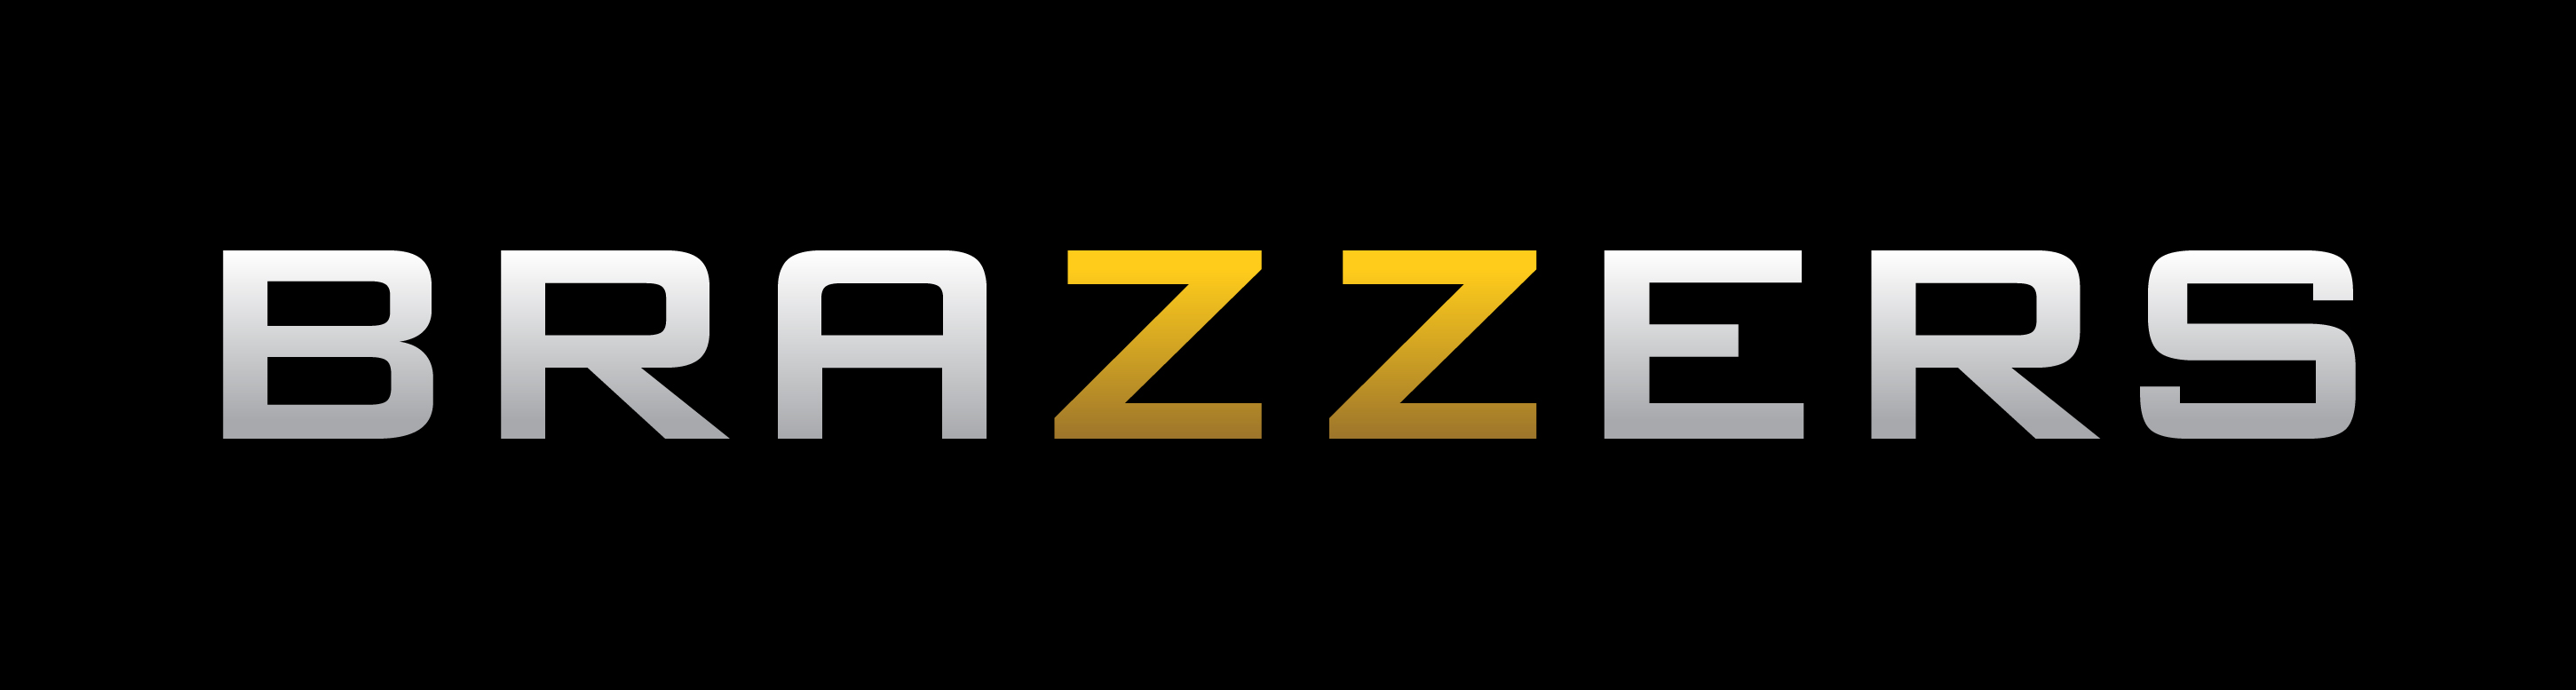 telekanal-brazers-tv